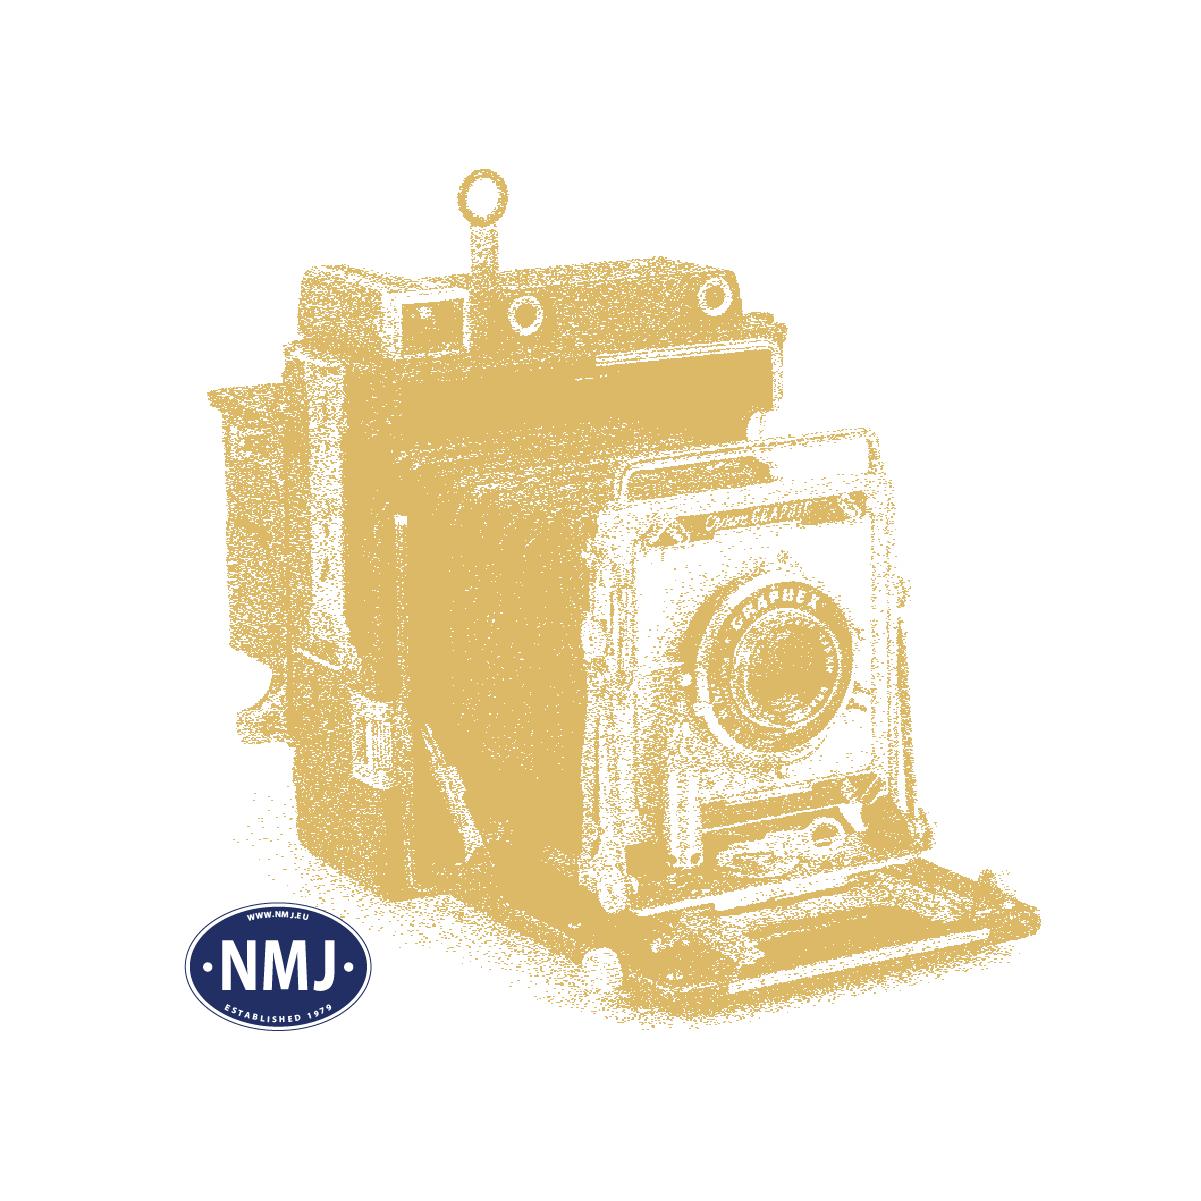 NMJT106.504 - NMJ Topline NSB B3-6 25614